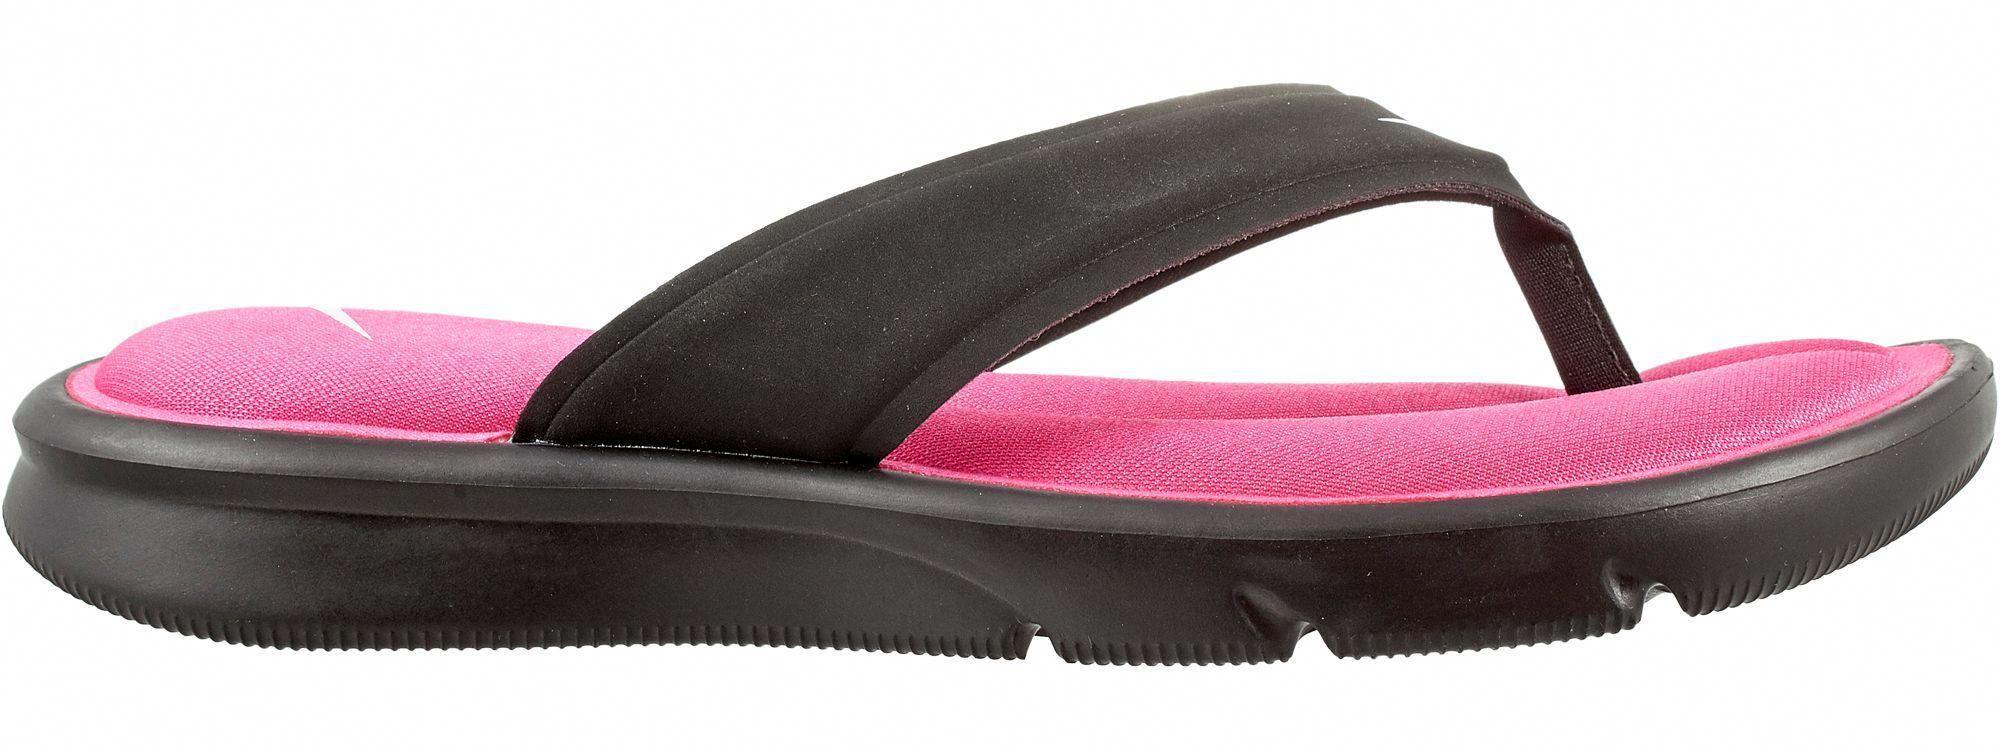 02f4ac0b4dfb Nike Women s Ultra Comfort Thong Flip Flops